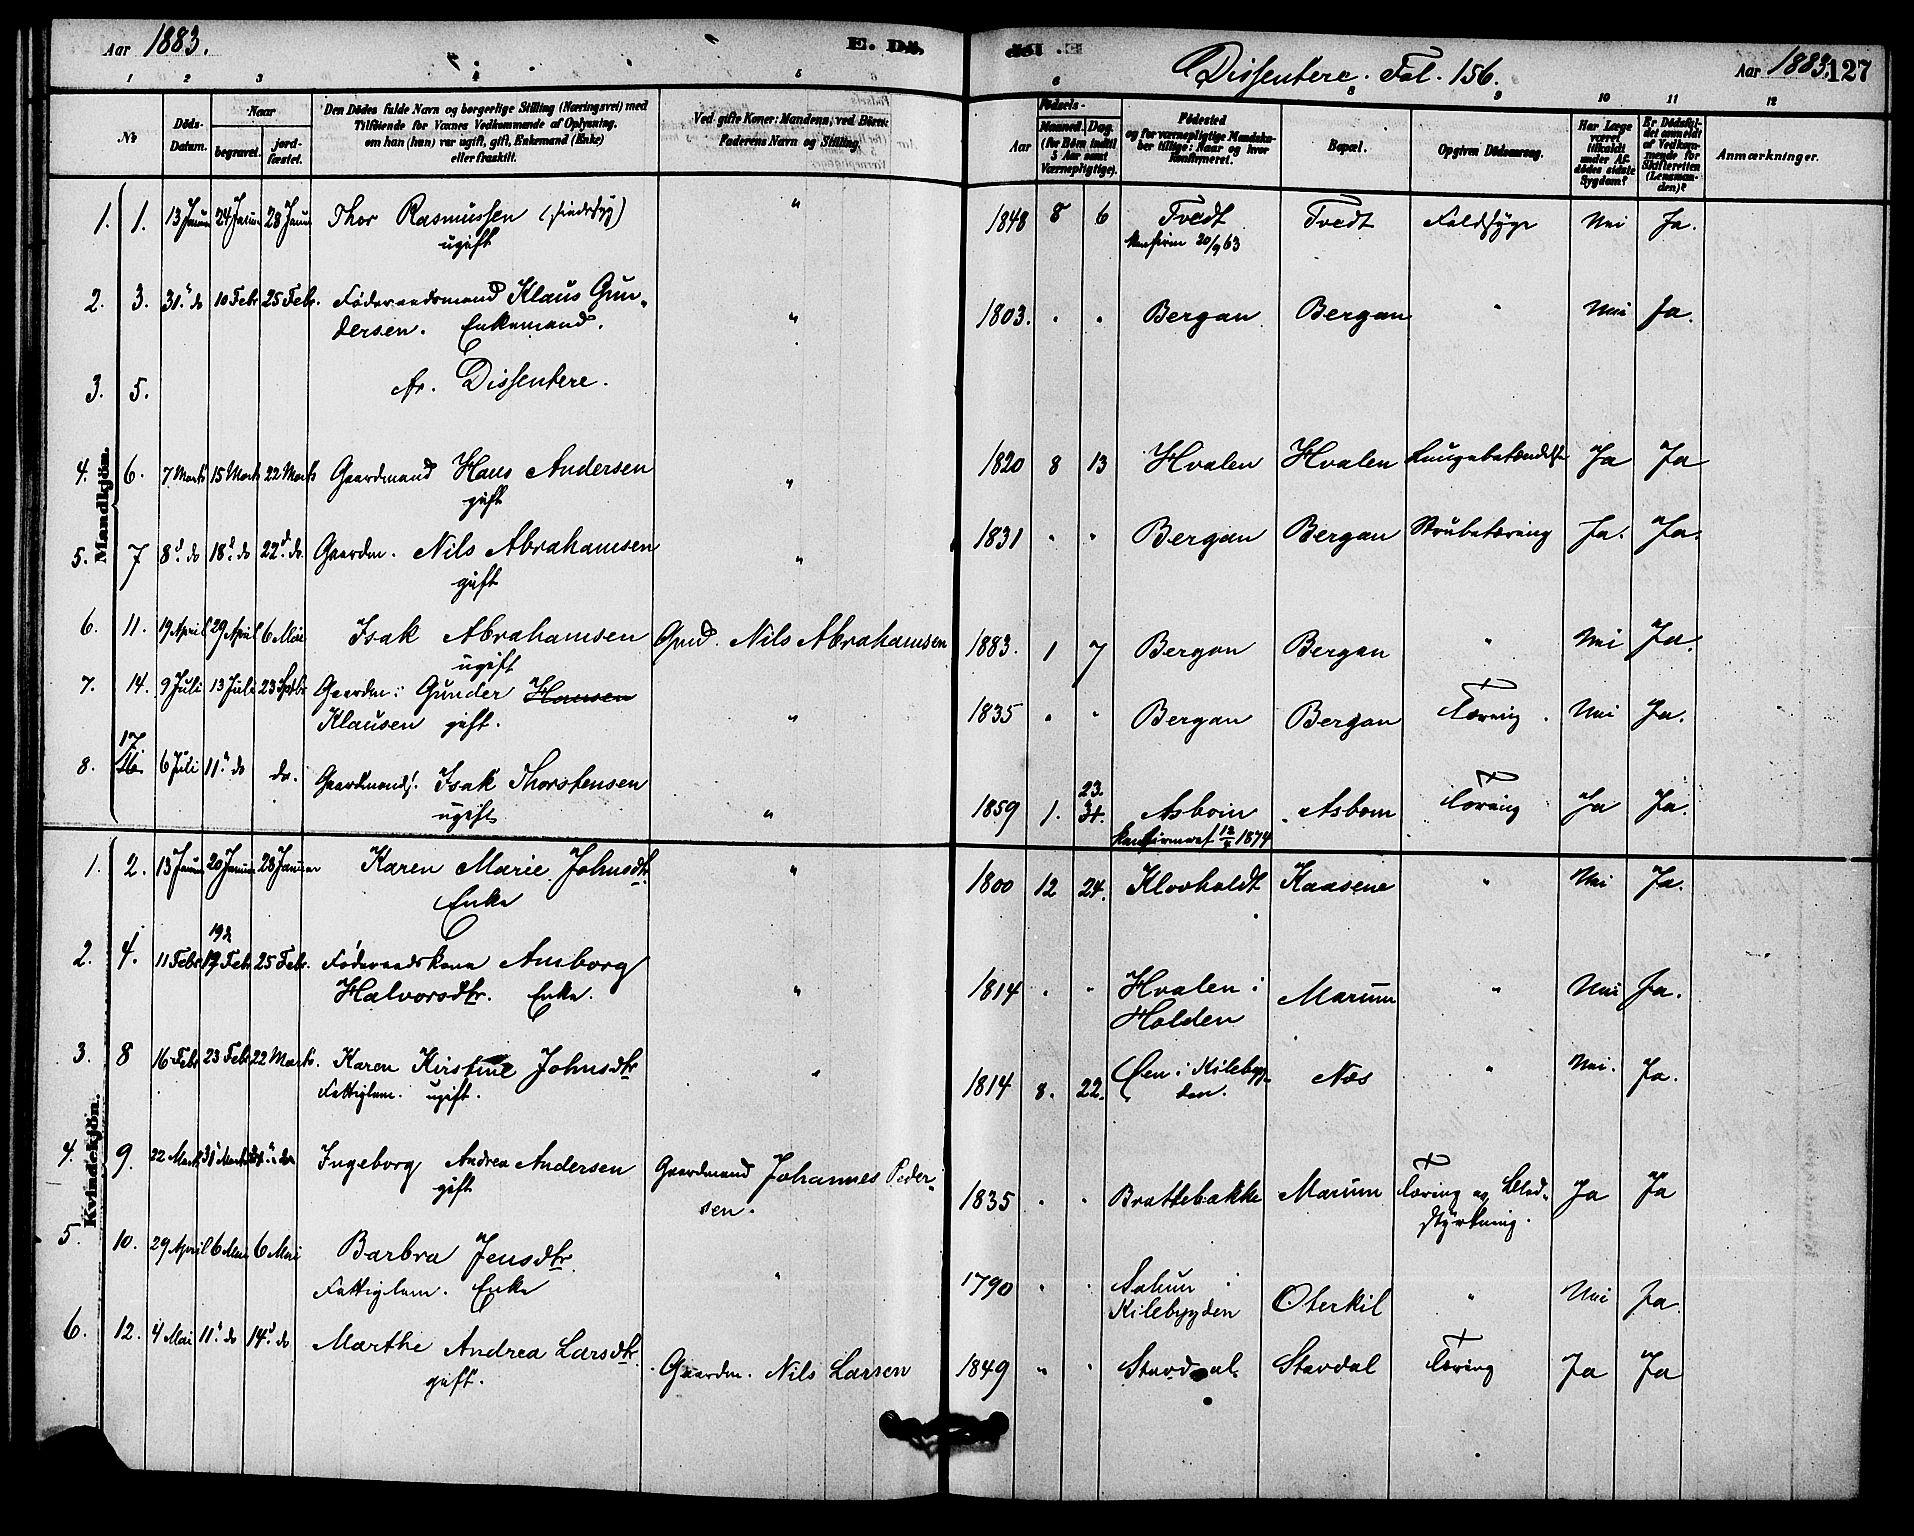 SAKO, Solum kirkebøker, F/Fb/L0001: Ministerialbok nr. II 1, 1877-1892, s. 127